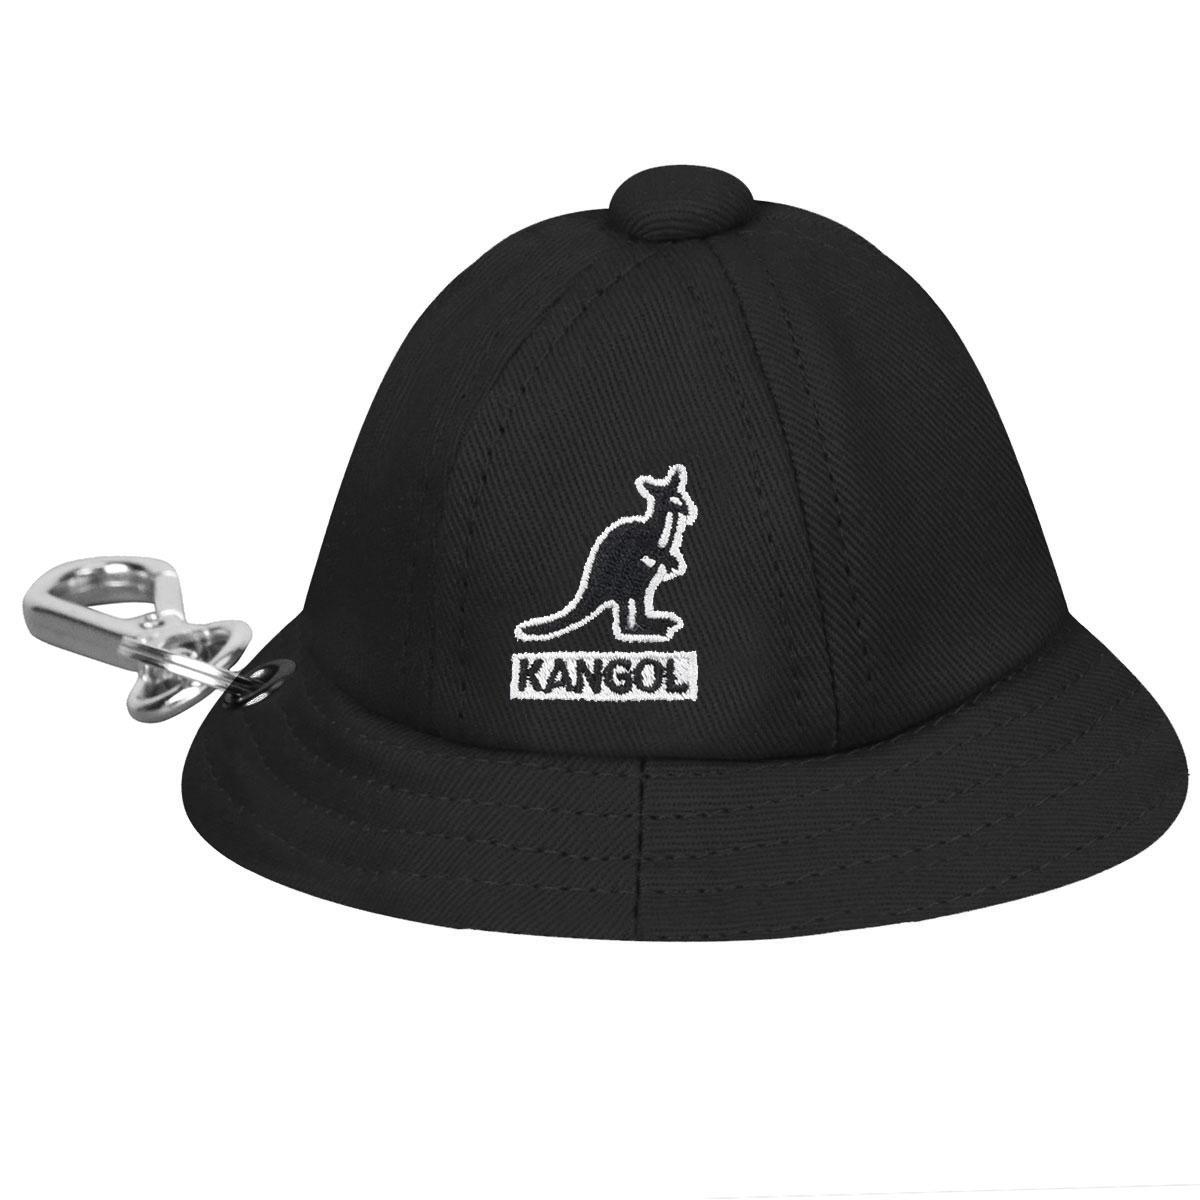 Kangol Kangol Casual Keychain in Black